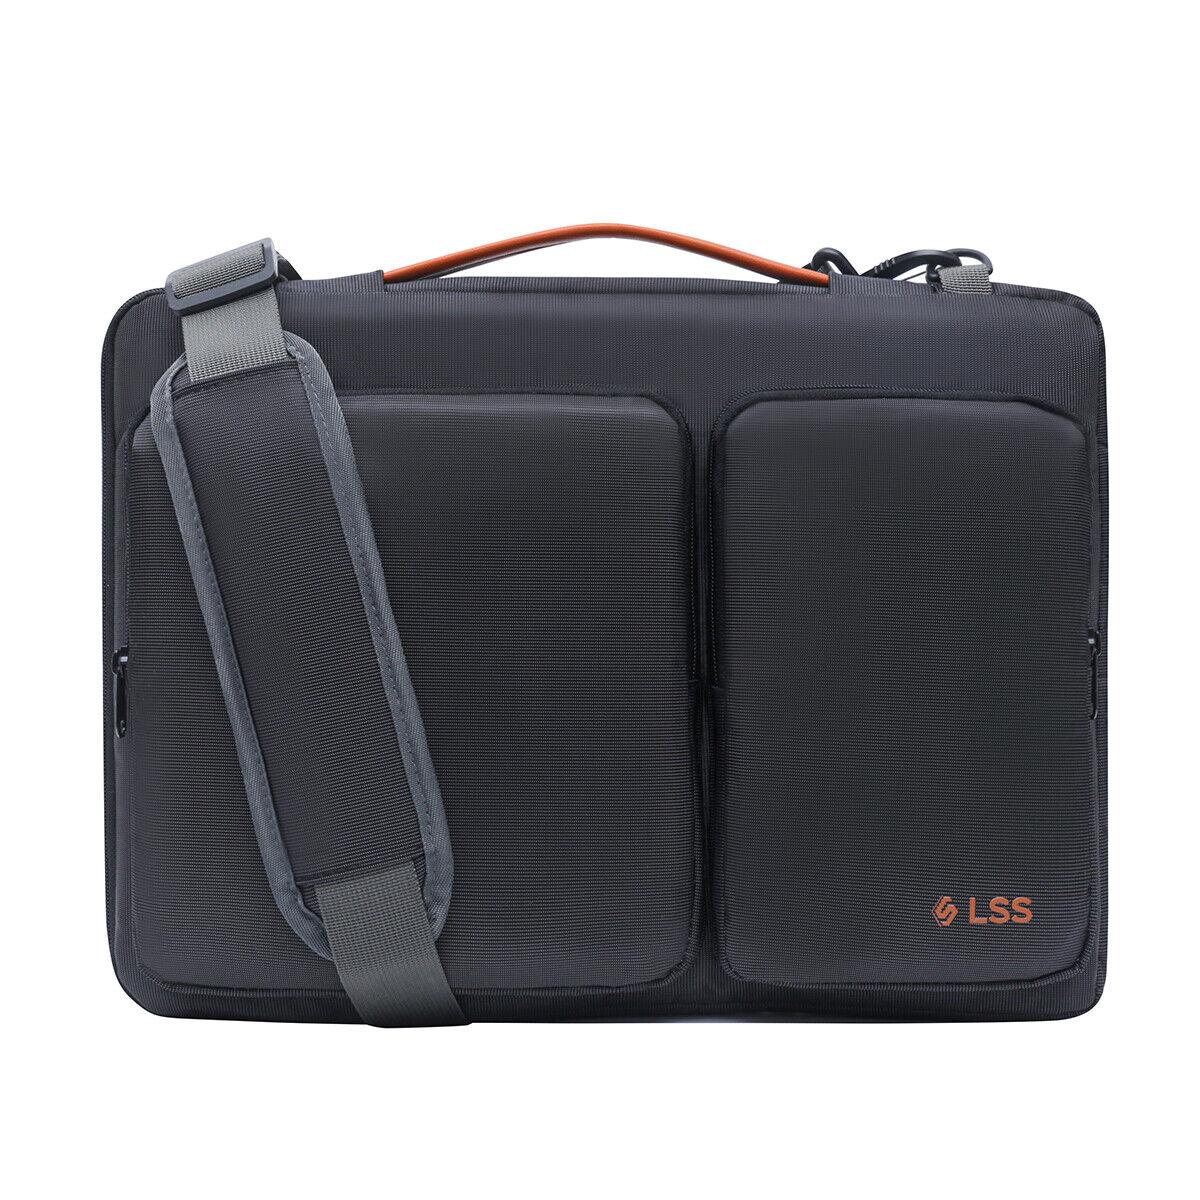 Laptop Notebook Case Sleeve Computer Bag with Pocket Shoulder Strap . Buy it now for 26.95